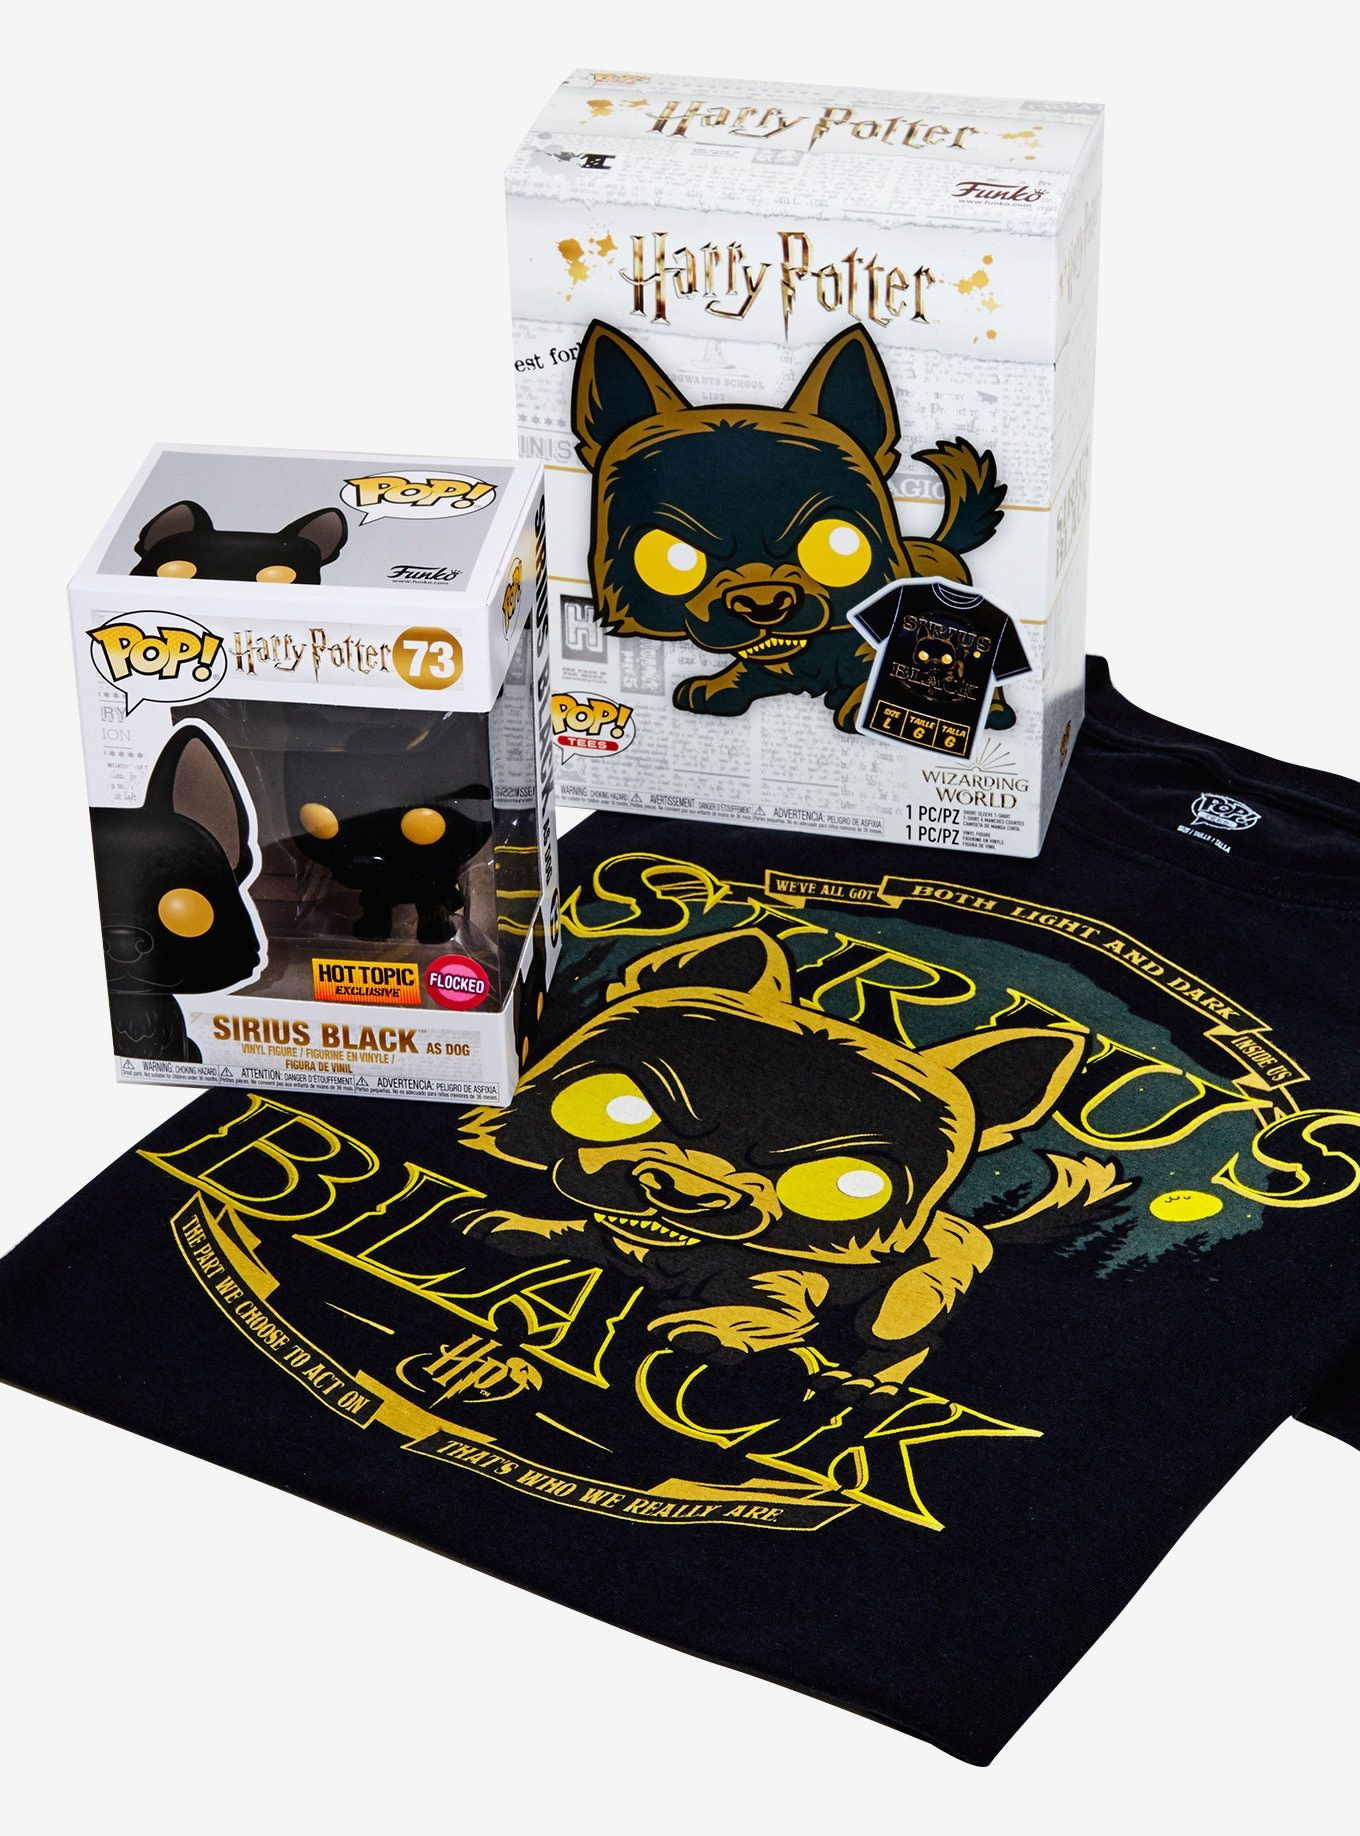 Funko Harry Potter Pop Tees Sirius Black As Dog Flocked Vinyl Figure T Shirt Box Set Hot Topic Exclusive Sirius Black Harry Potter Sirius Sirius Black Dog